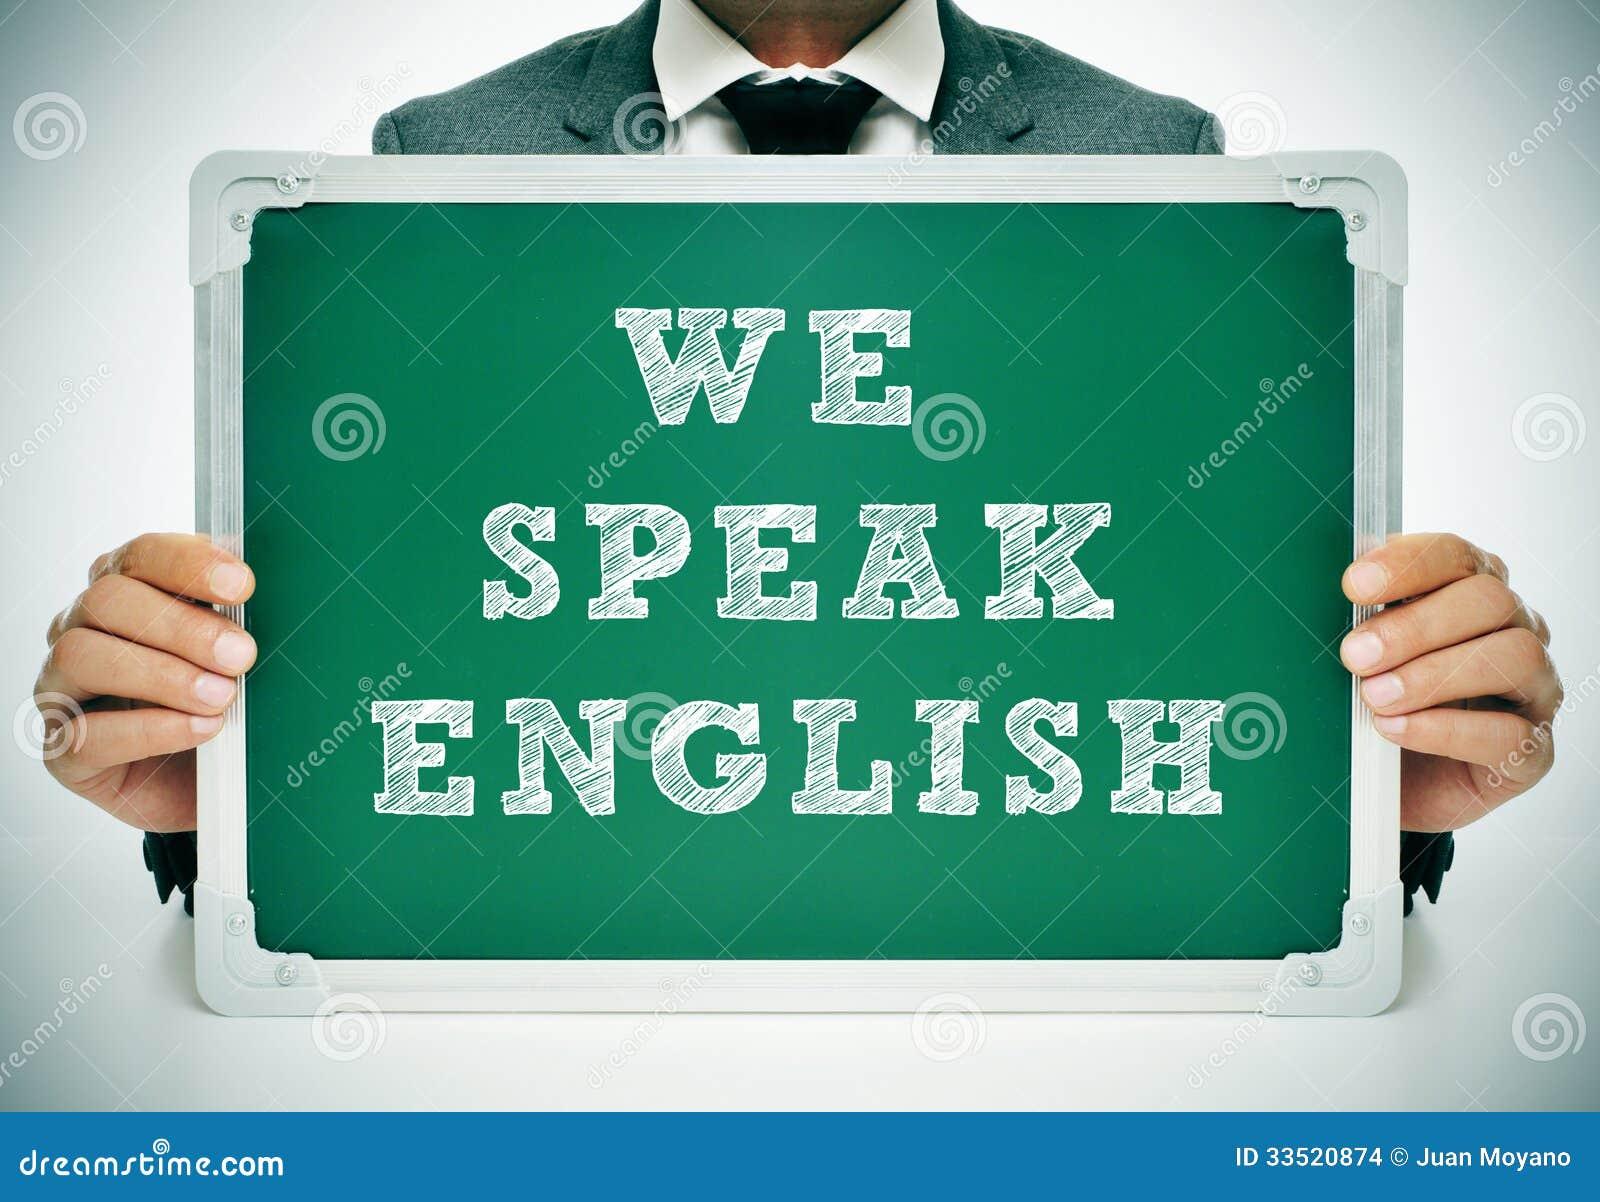 english we speak